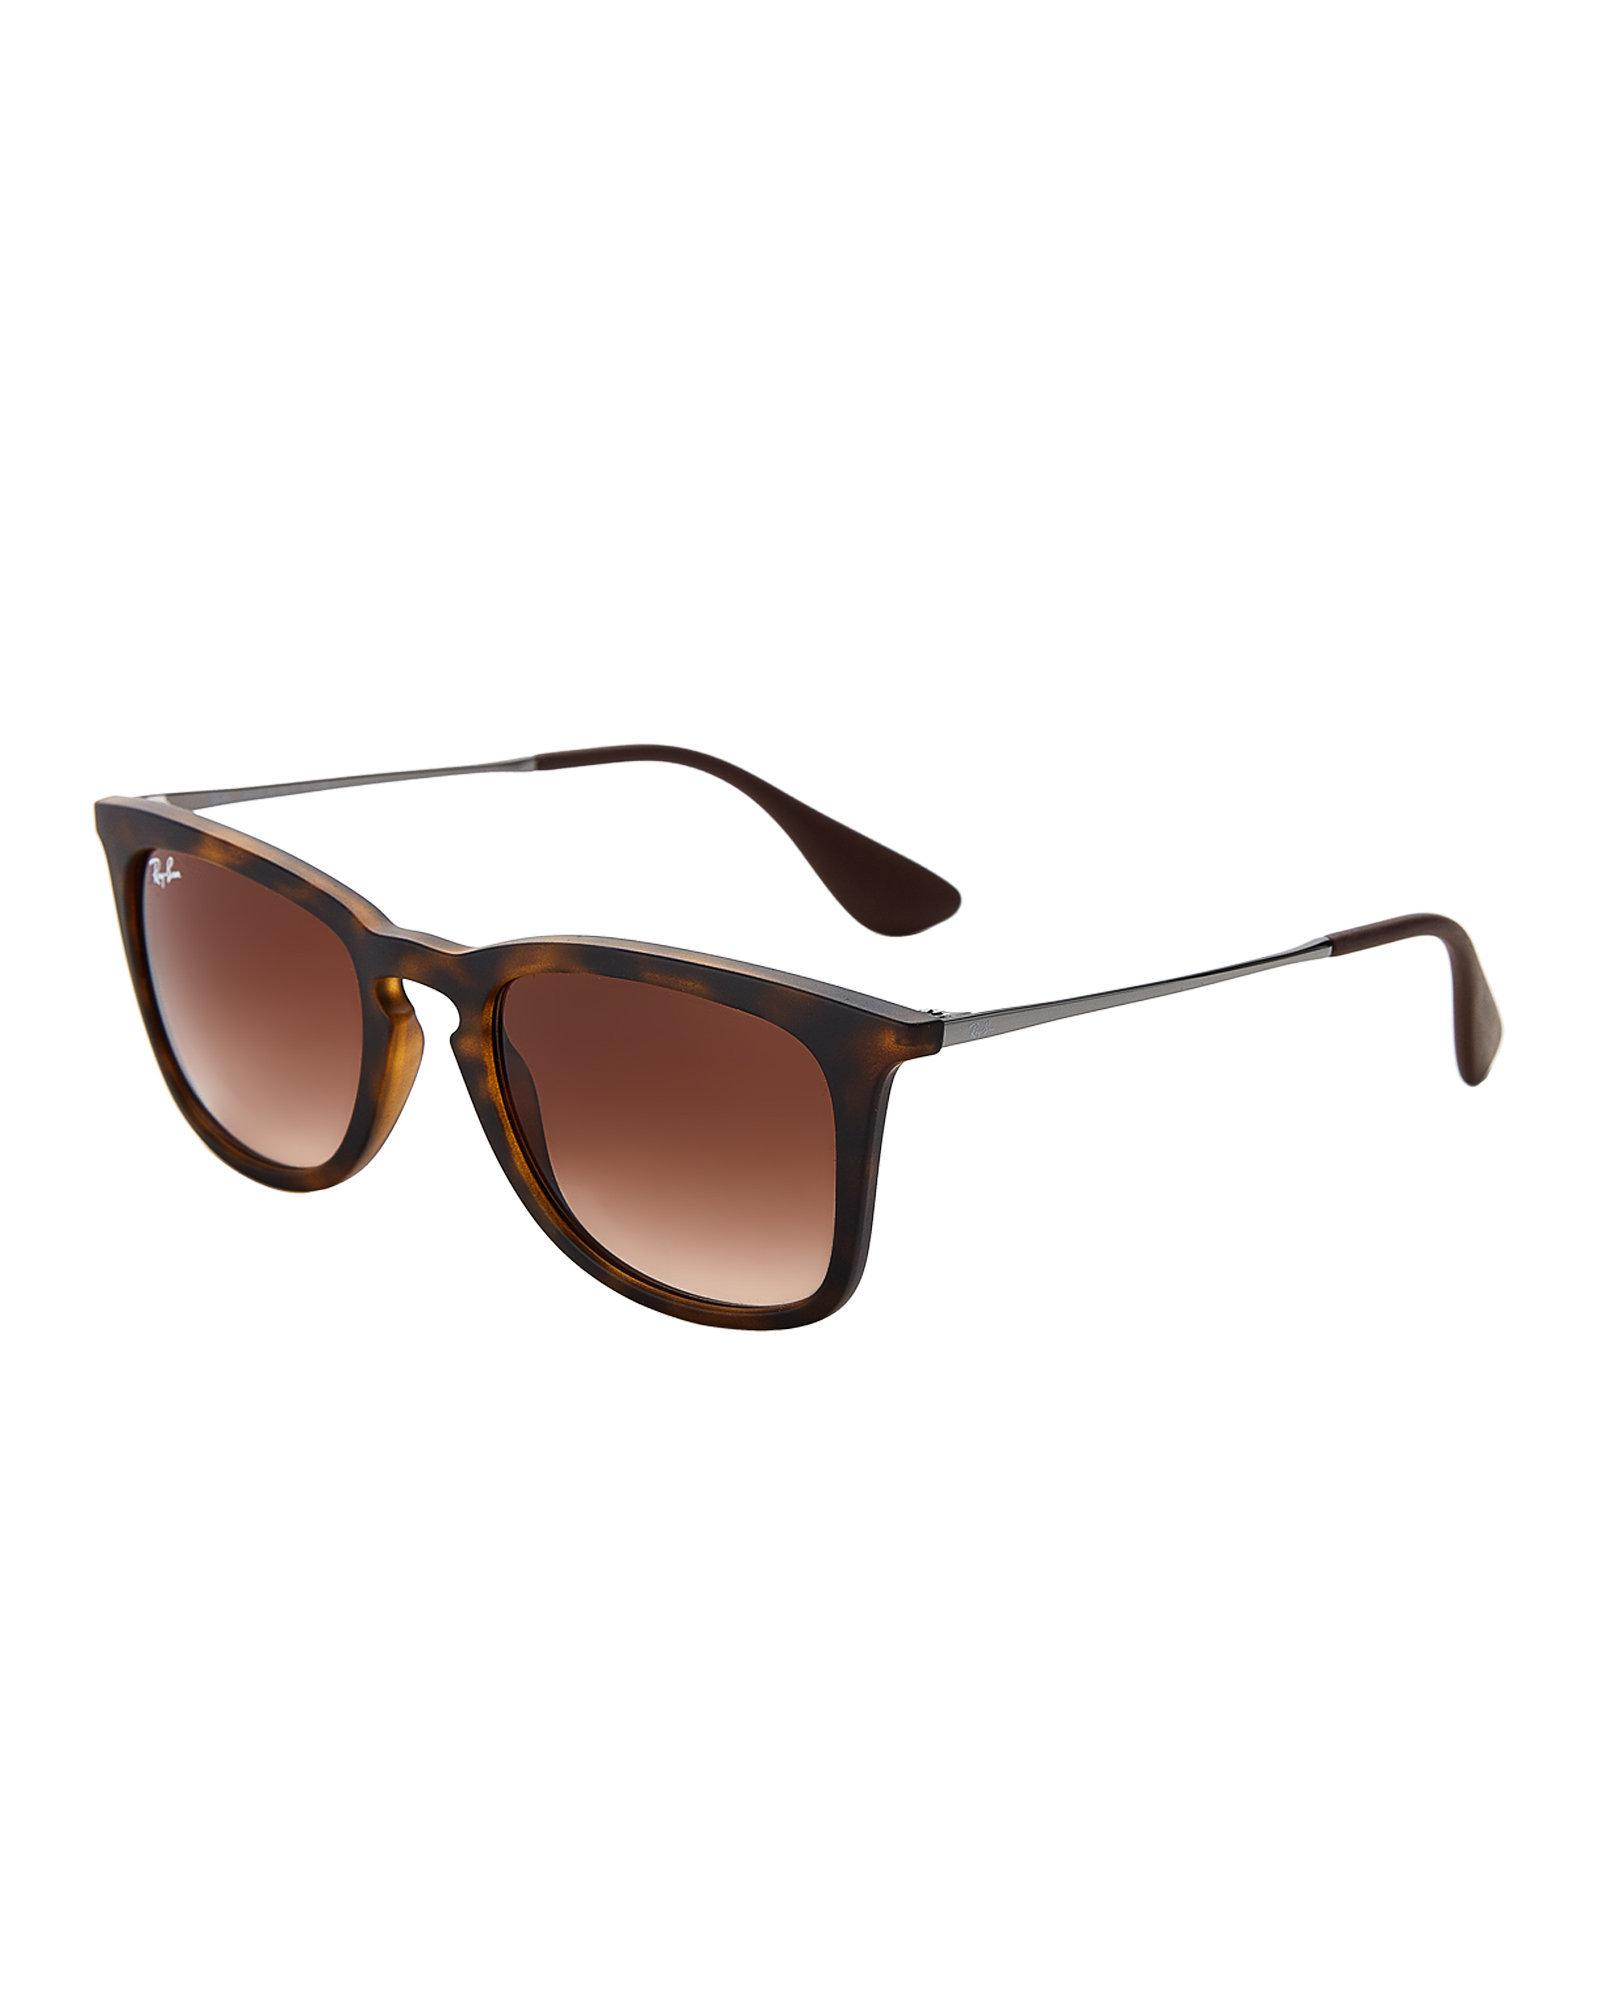 c2218b7a4e Lyst - Ray-Ban Tortoiseshell-look Rb4221 Wayfarer Sunglasses in Brown